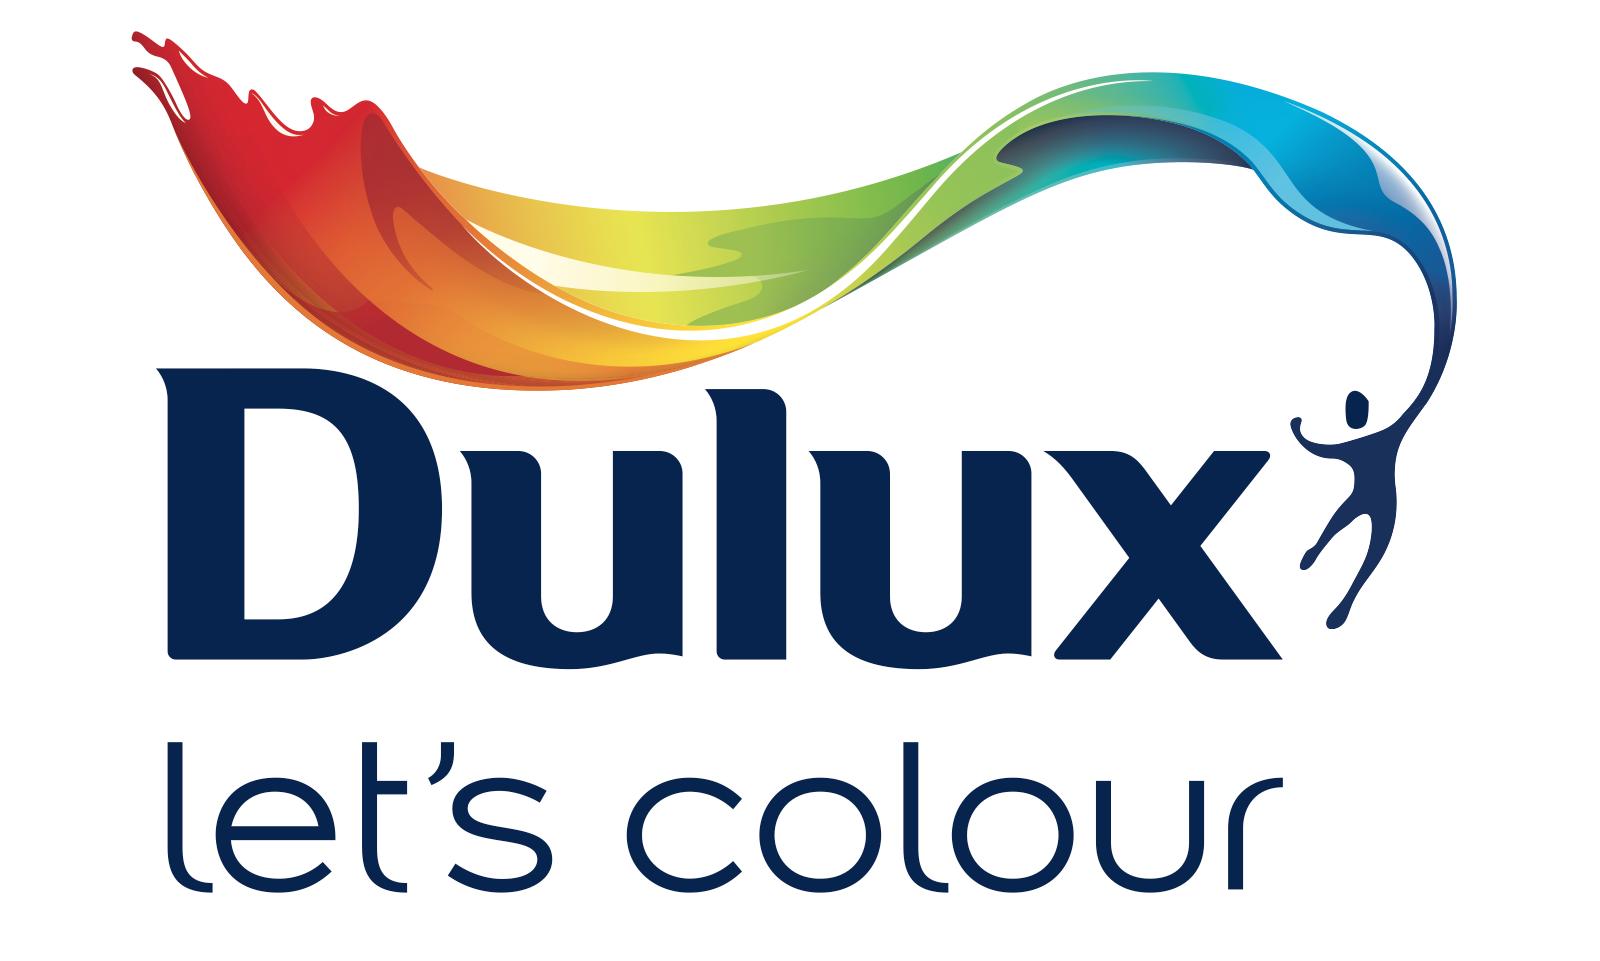 Dulux_logo_logotype_emblem.png